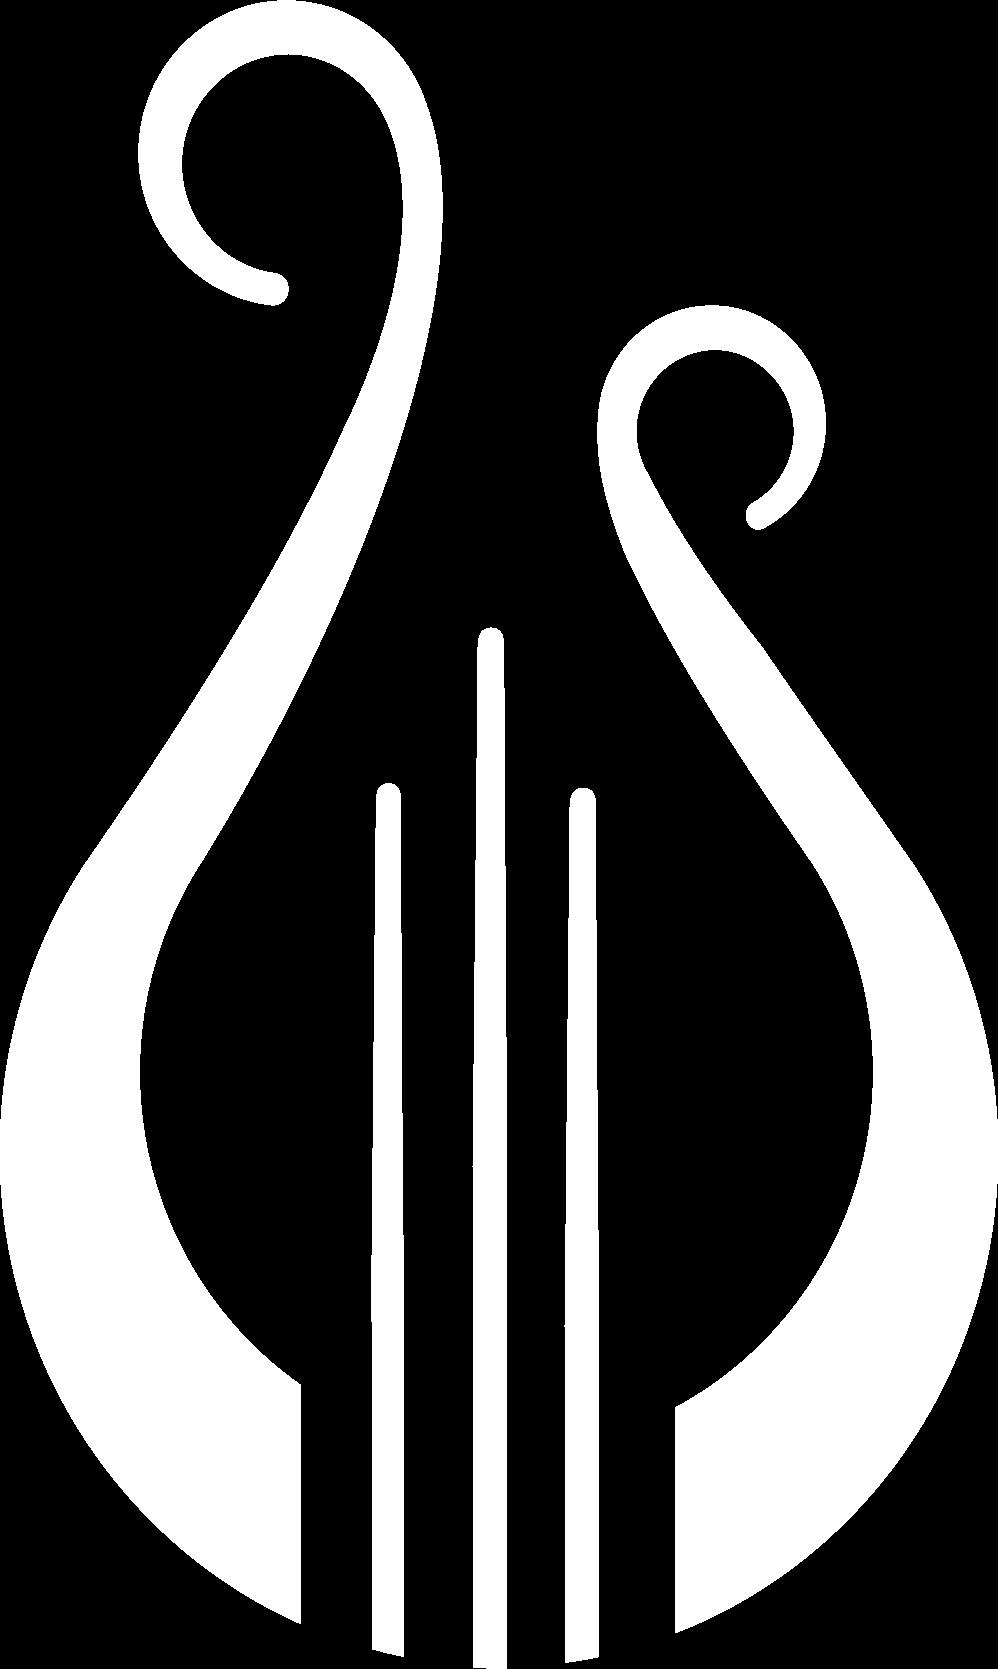 Theta Corporation of Alpha Chi Omega